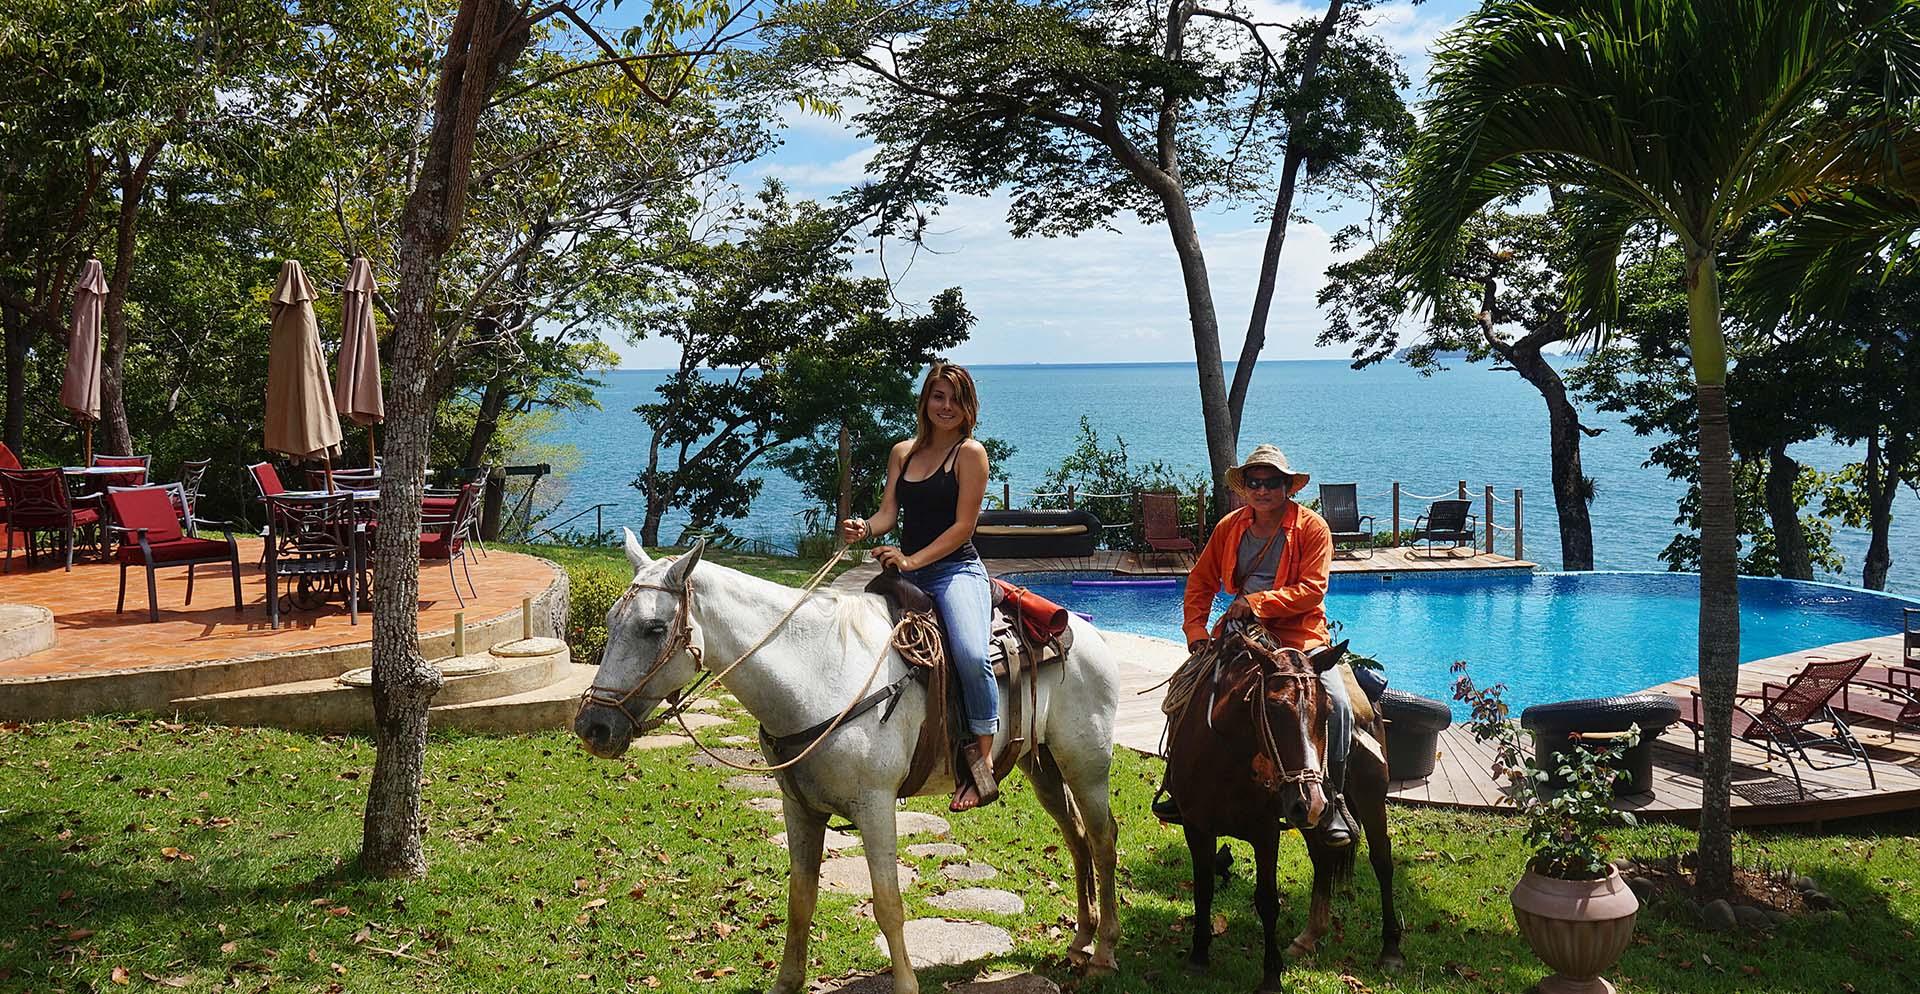 jungle horseback riding tours in Panama